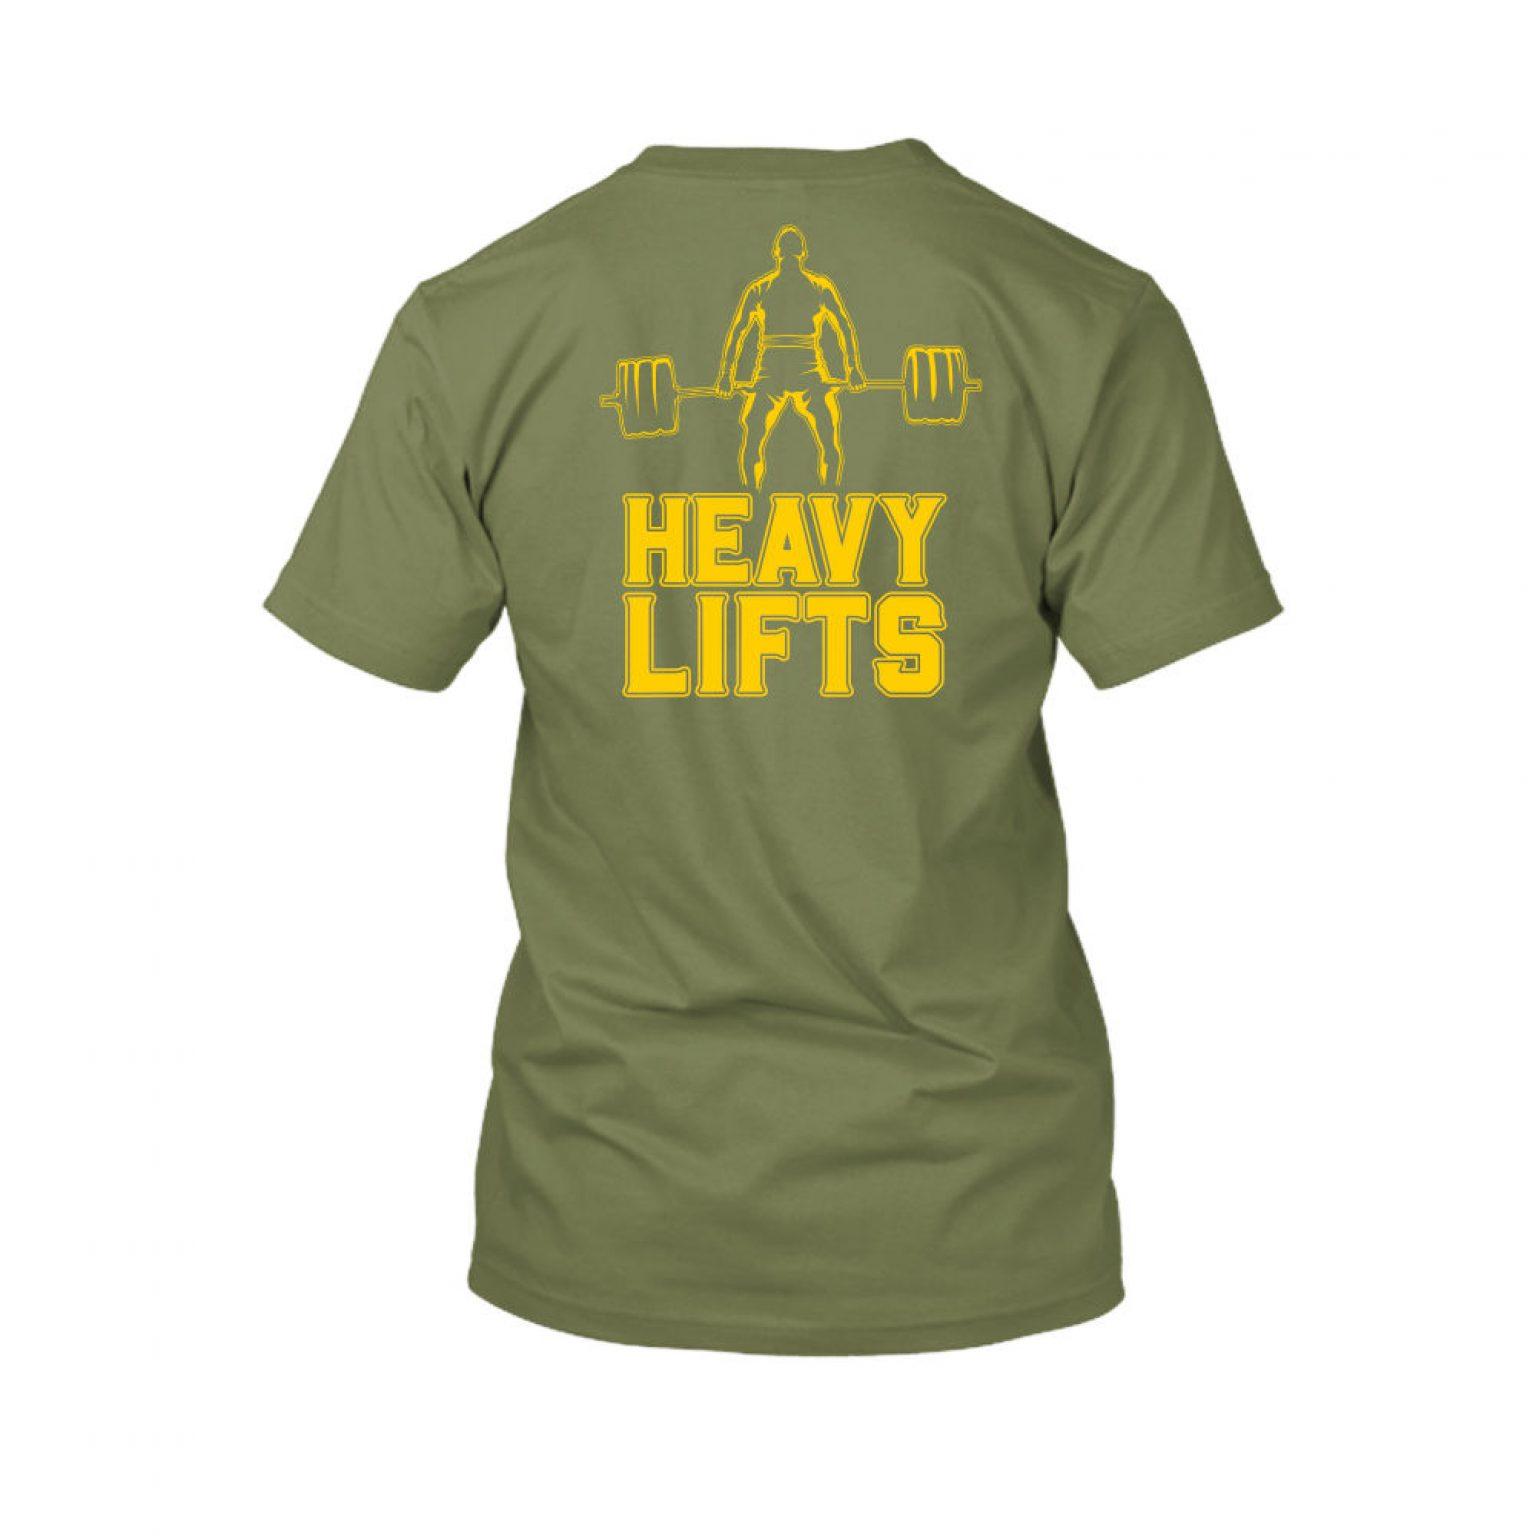 heavylifts shirt herren green back